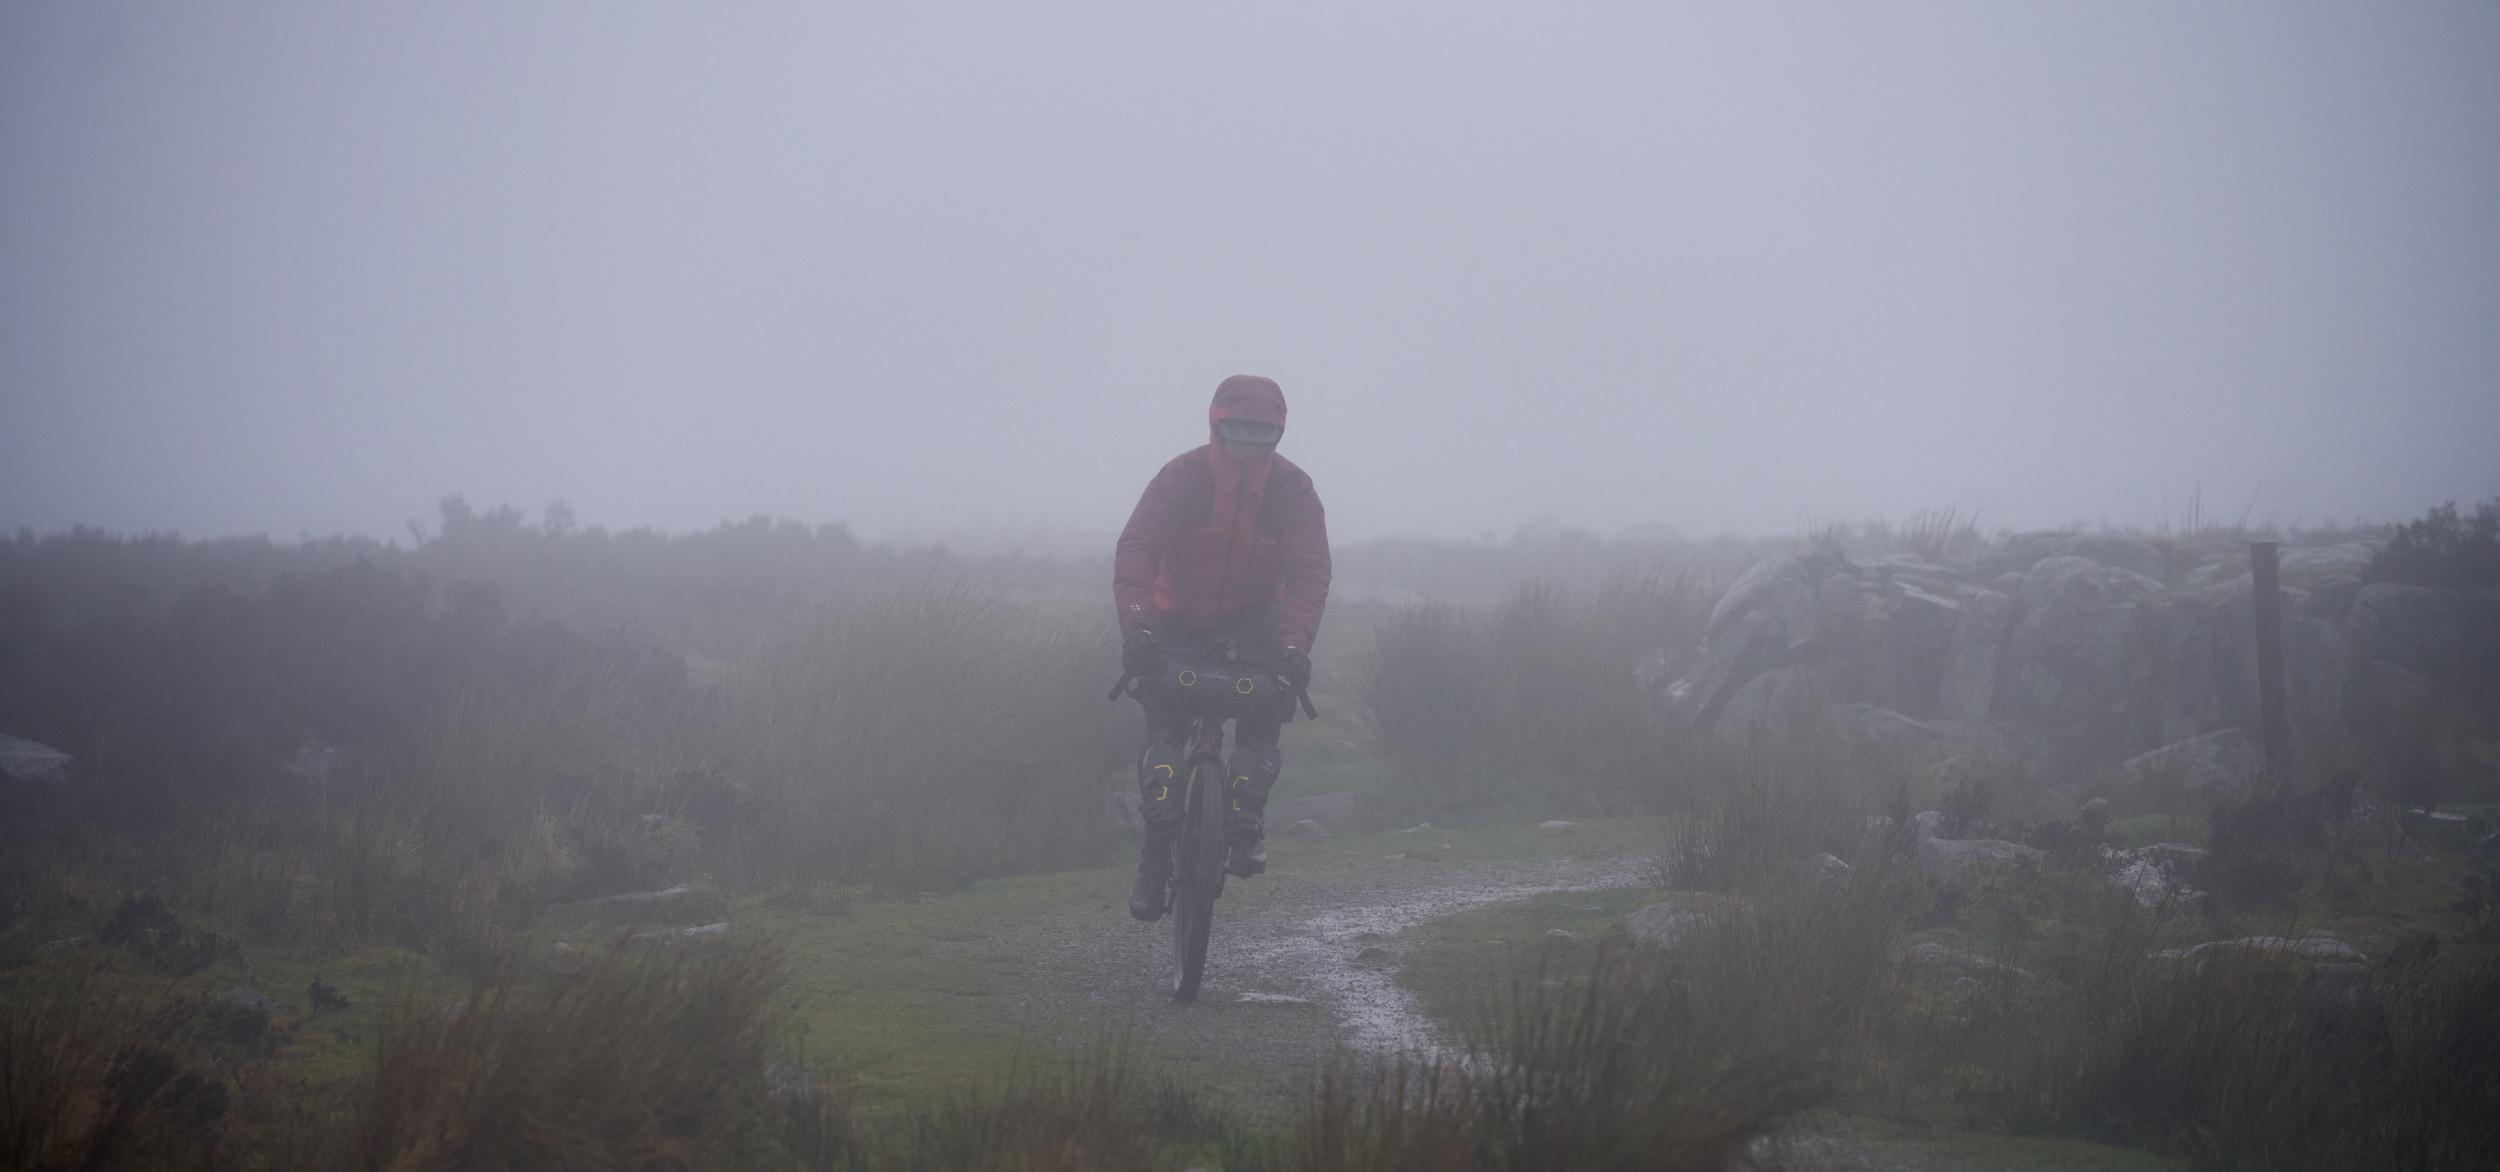 A rider in heavy mist